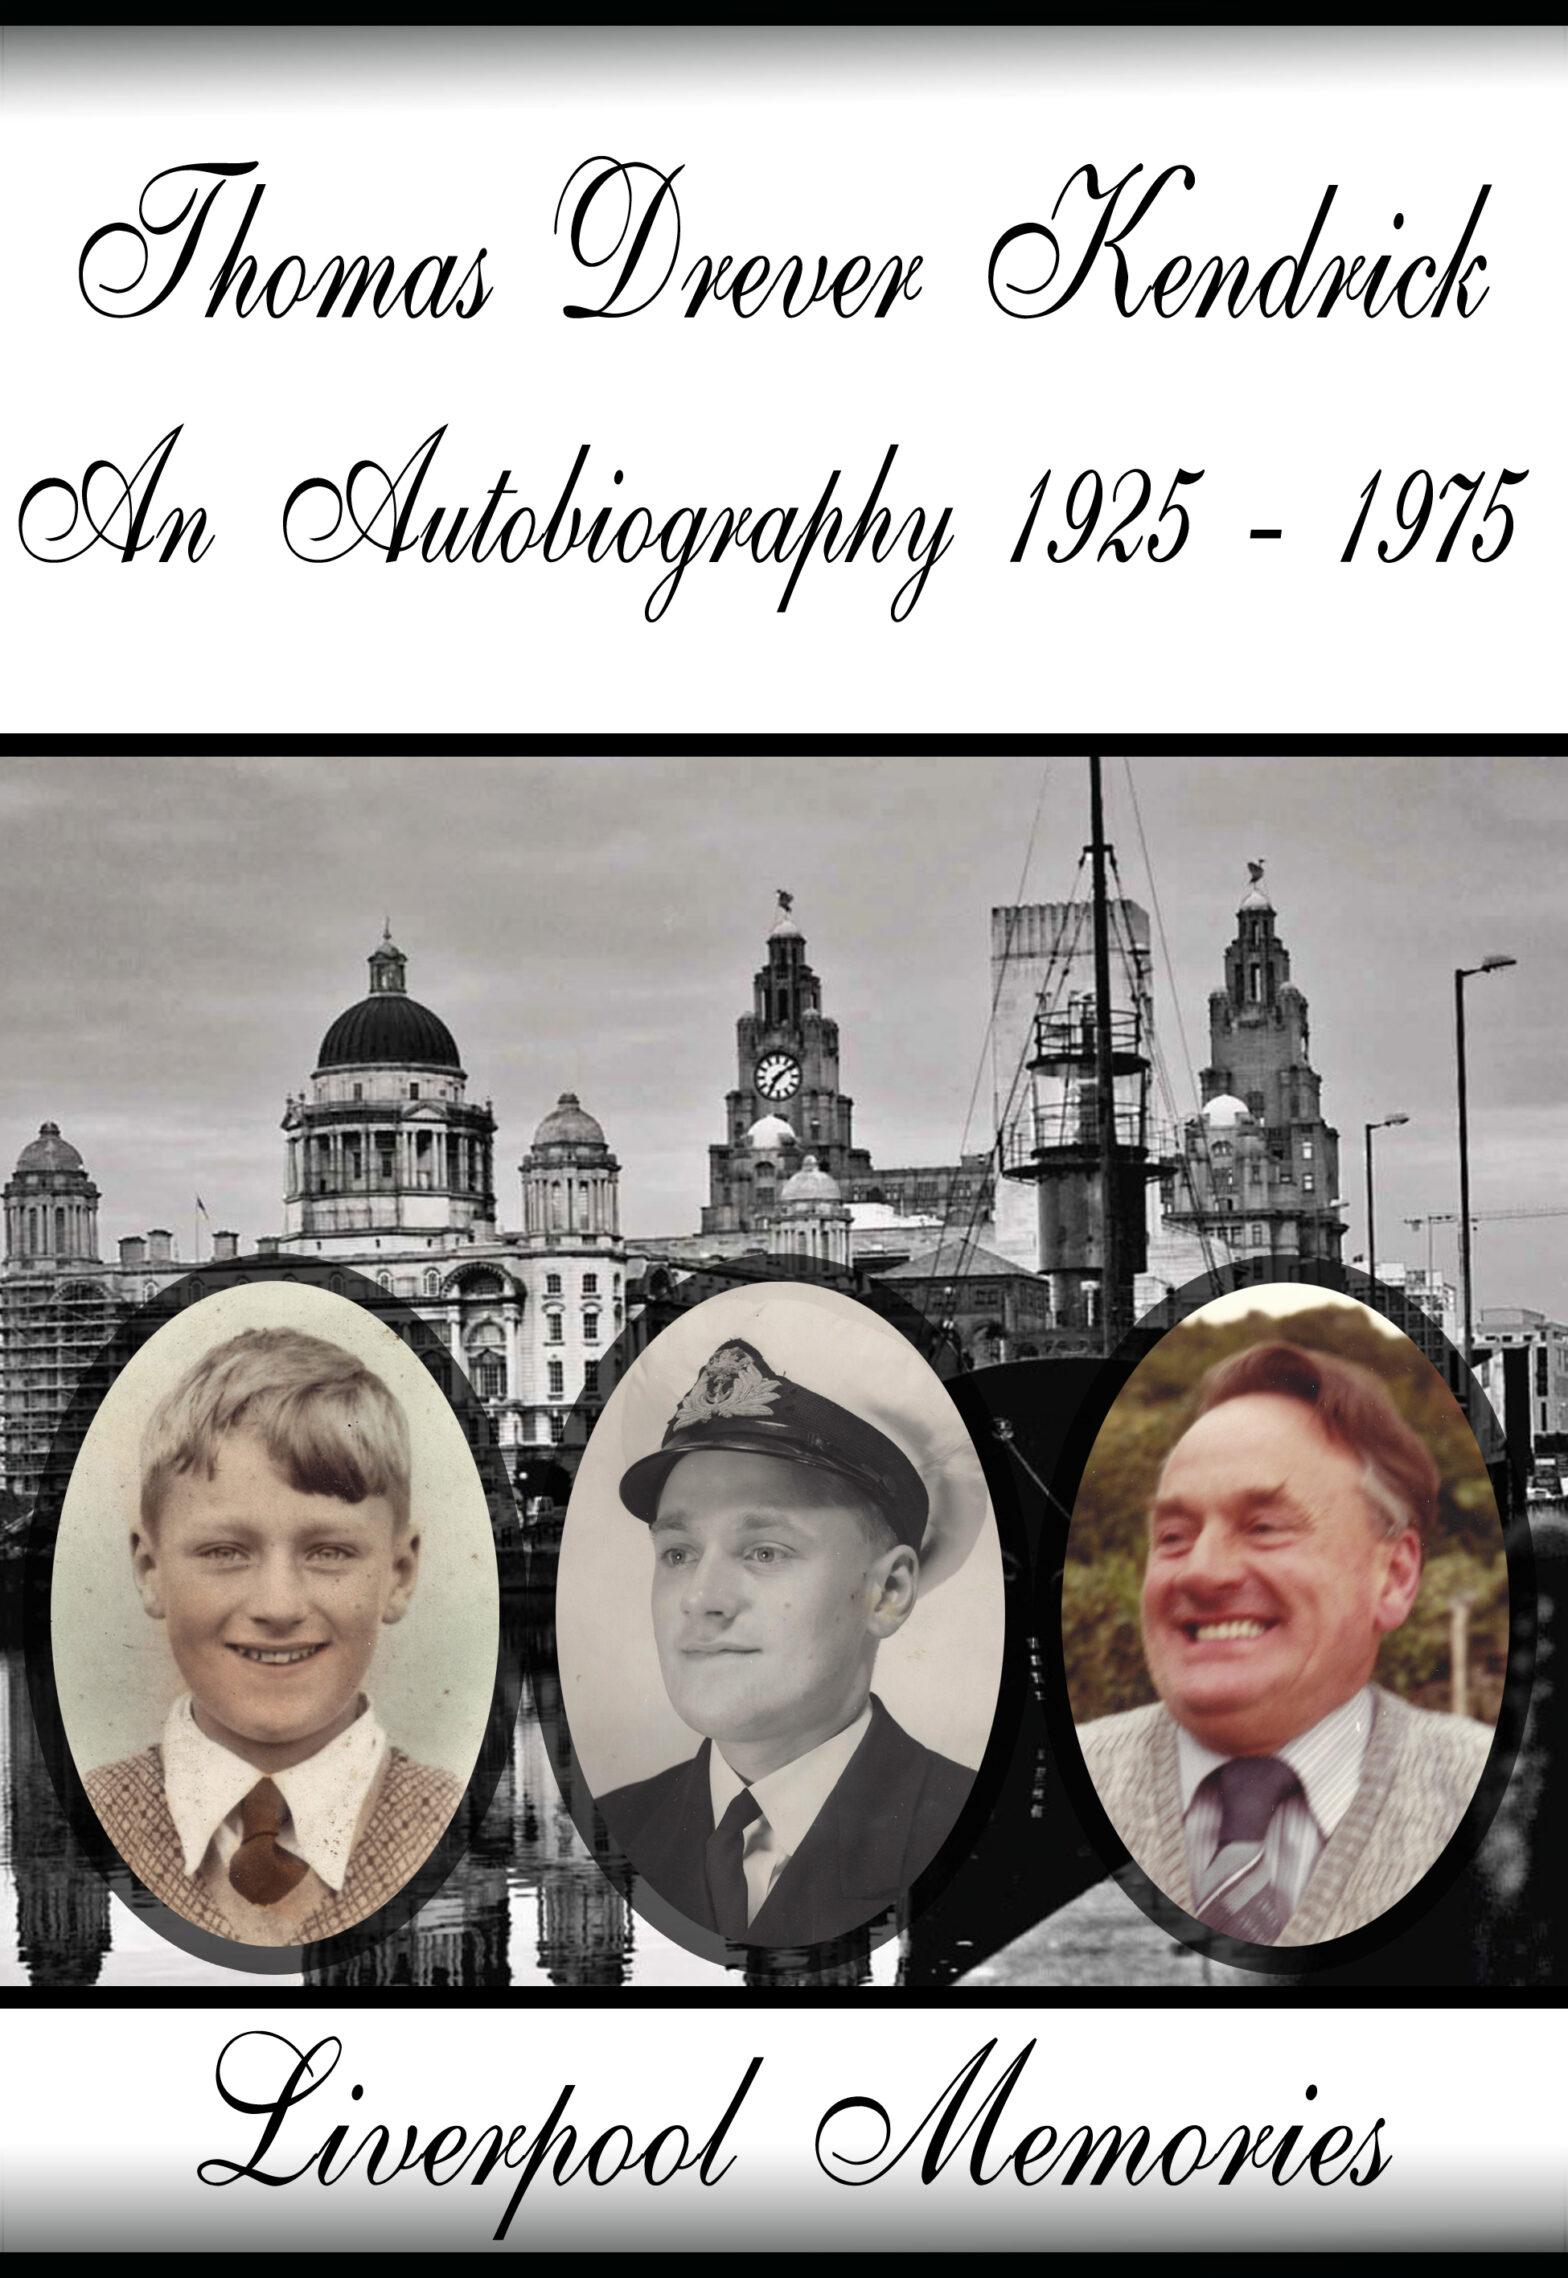 Liverpool Memories by Thomas Kendrick